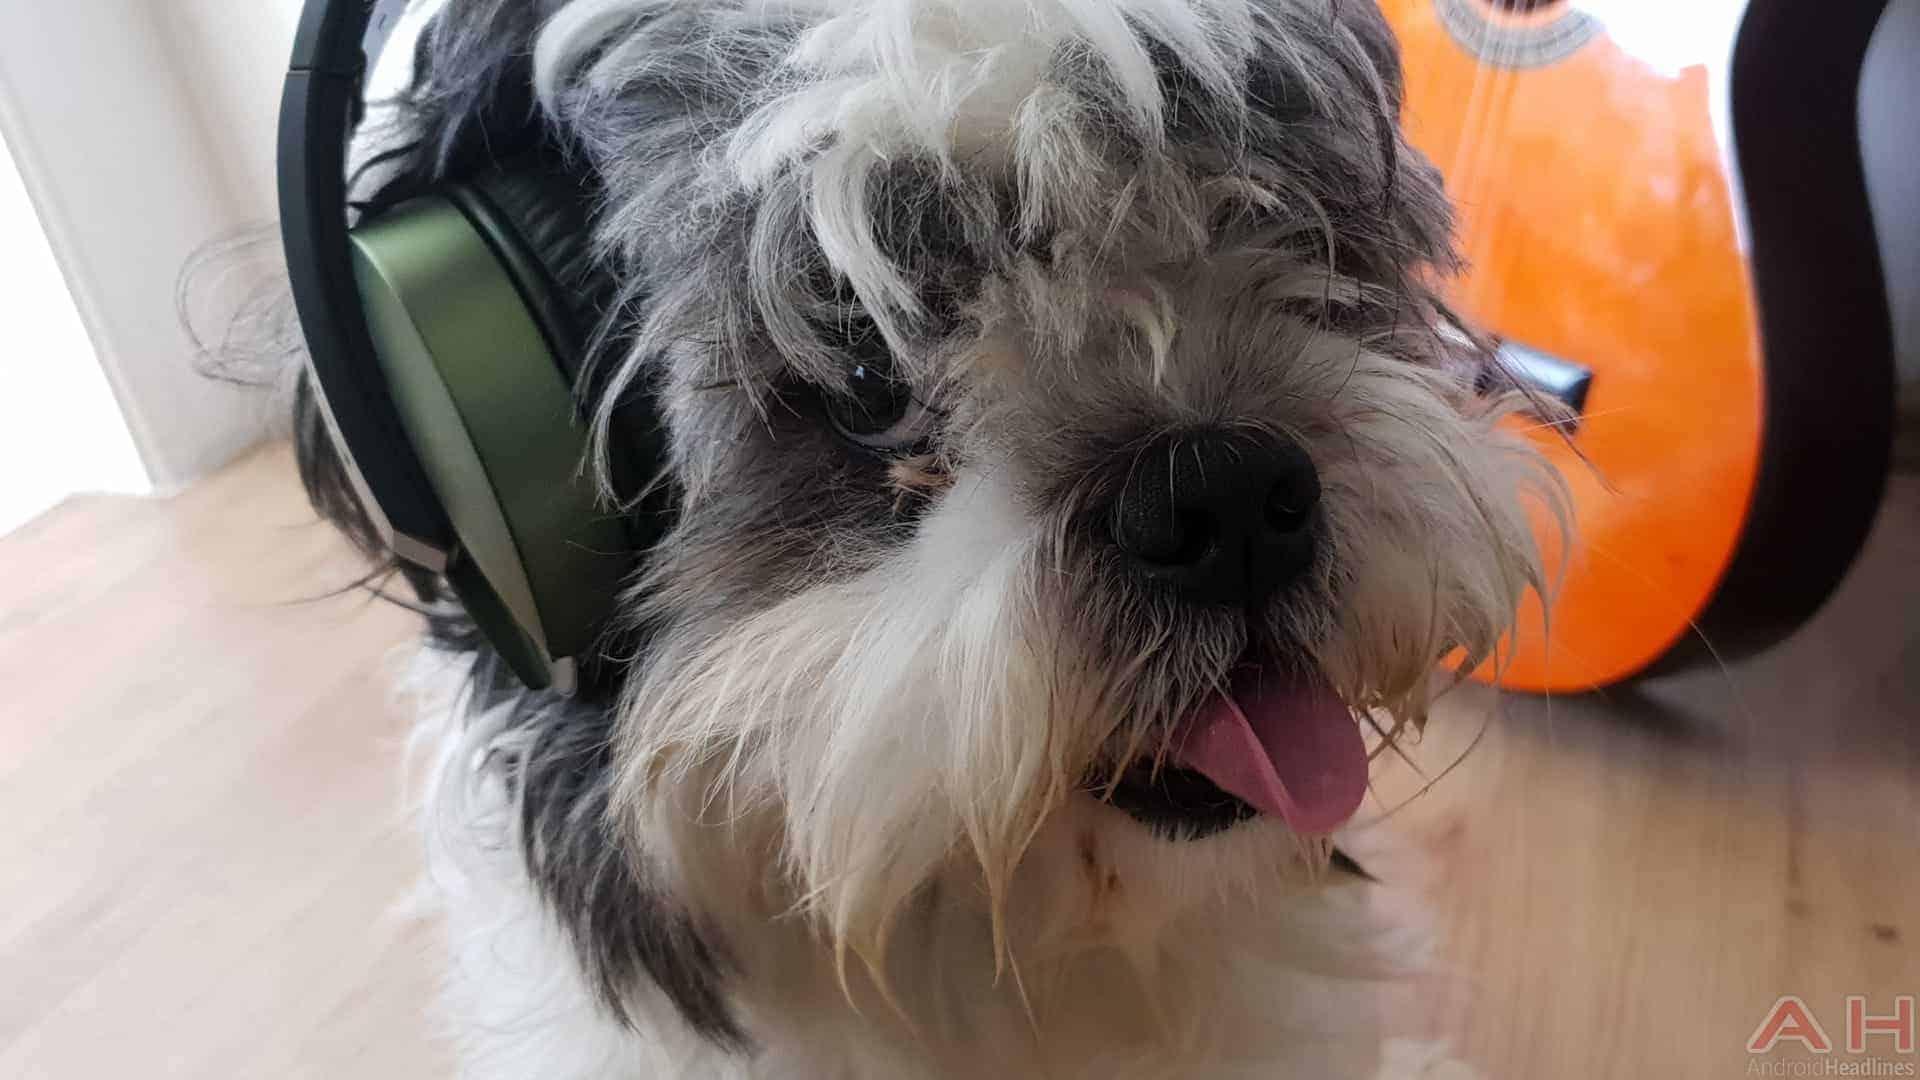 Focal Listen Wireless Chic Headphones AH 8